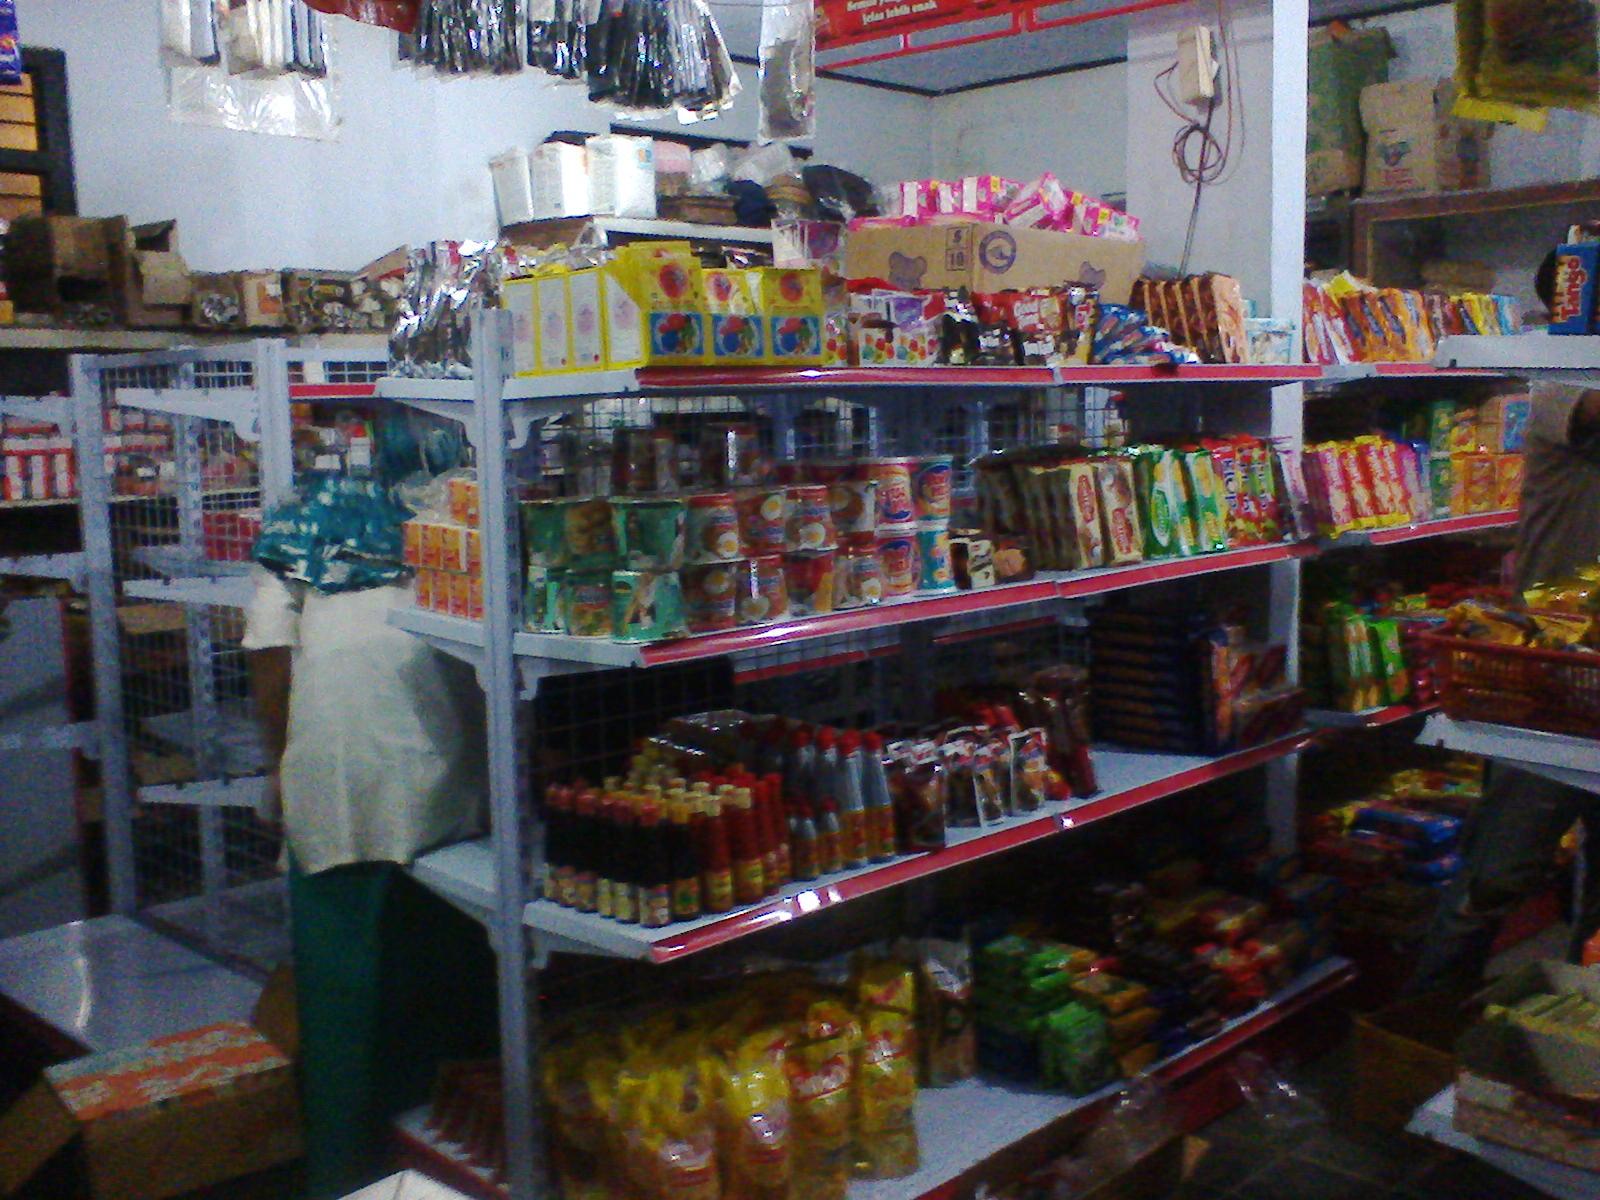 Jual Rak Toko/Minimarket/Swalayan: Pemasangan Rak